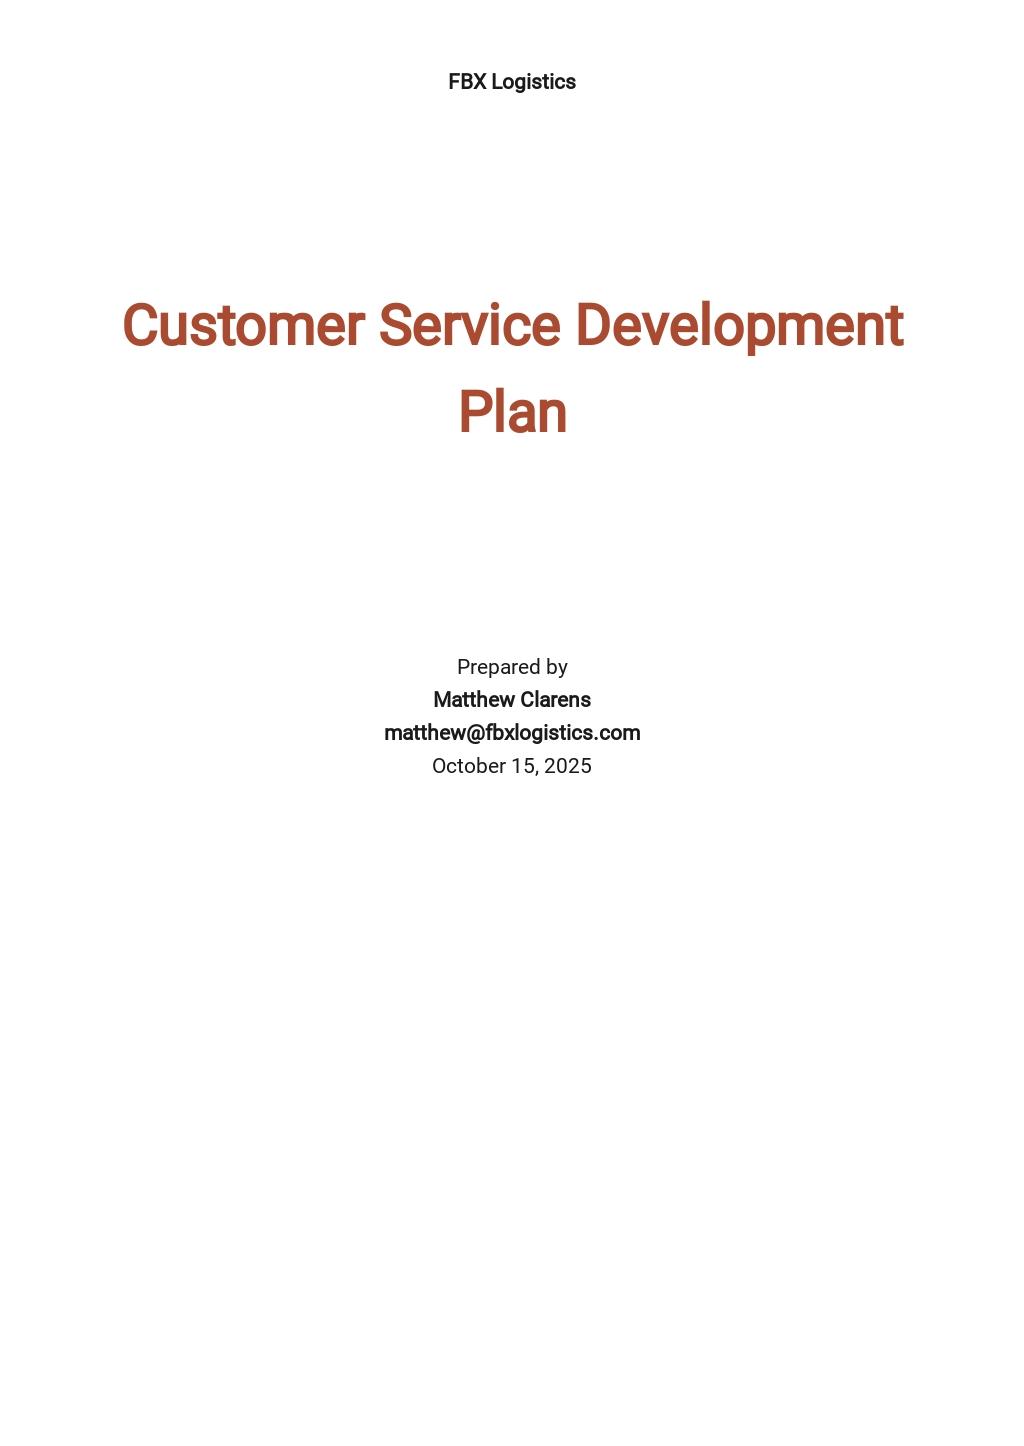 Customer Service Development Plan Template